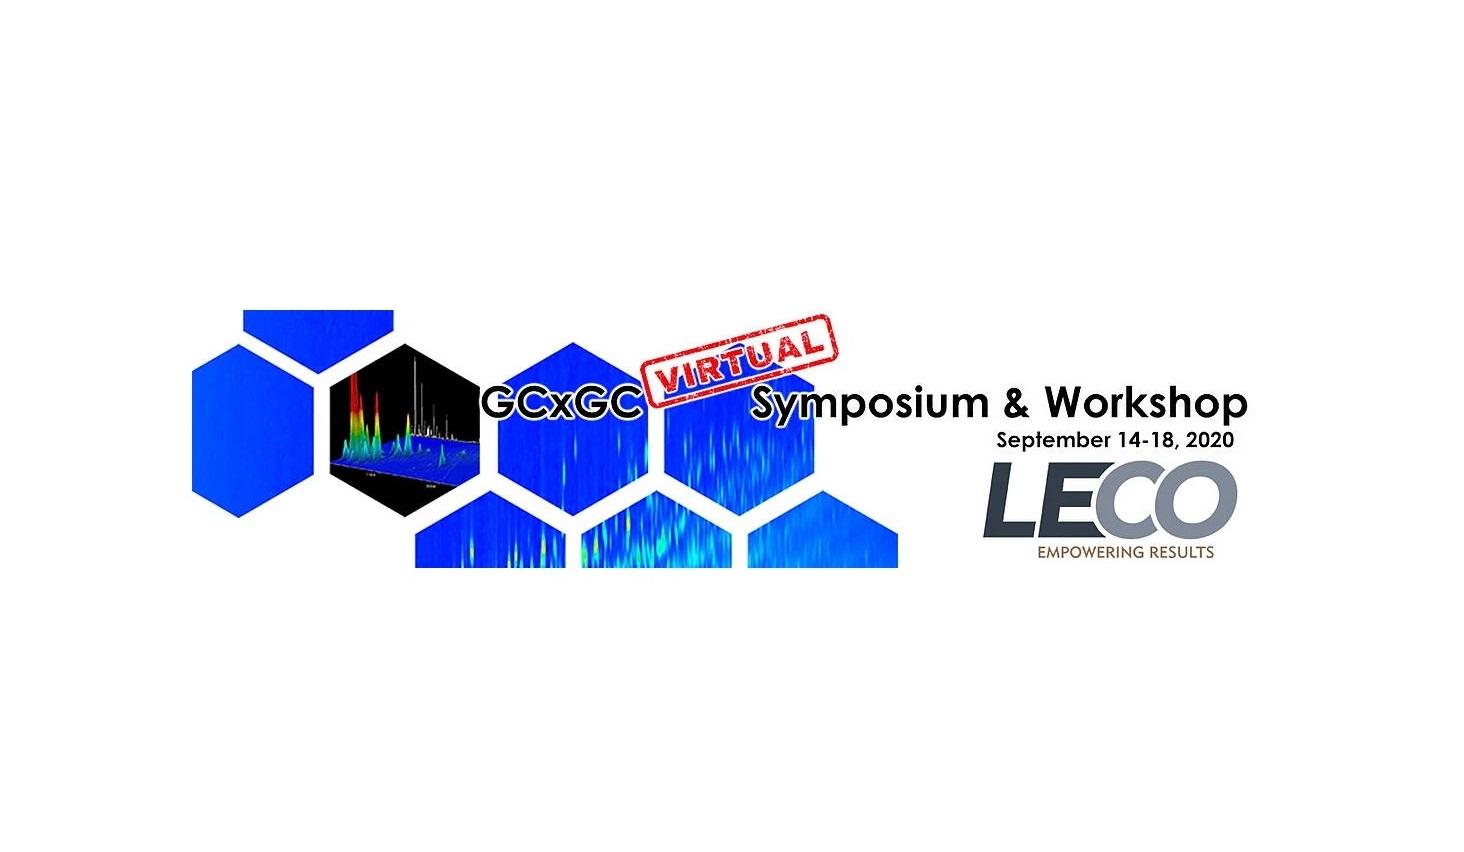 LECO: První severoamerické GCxGC Symposium & Workshop